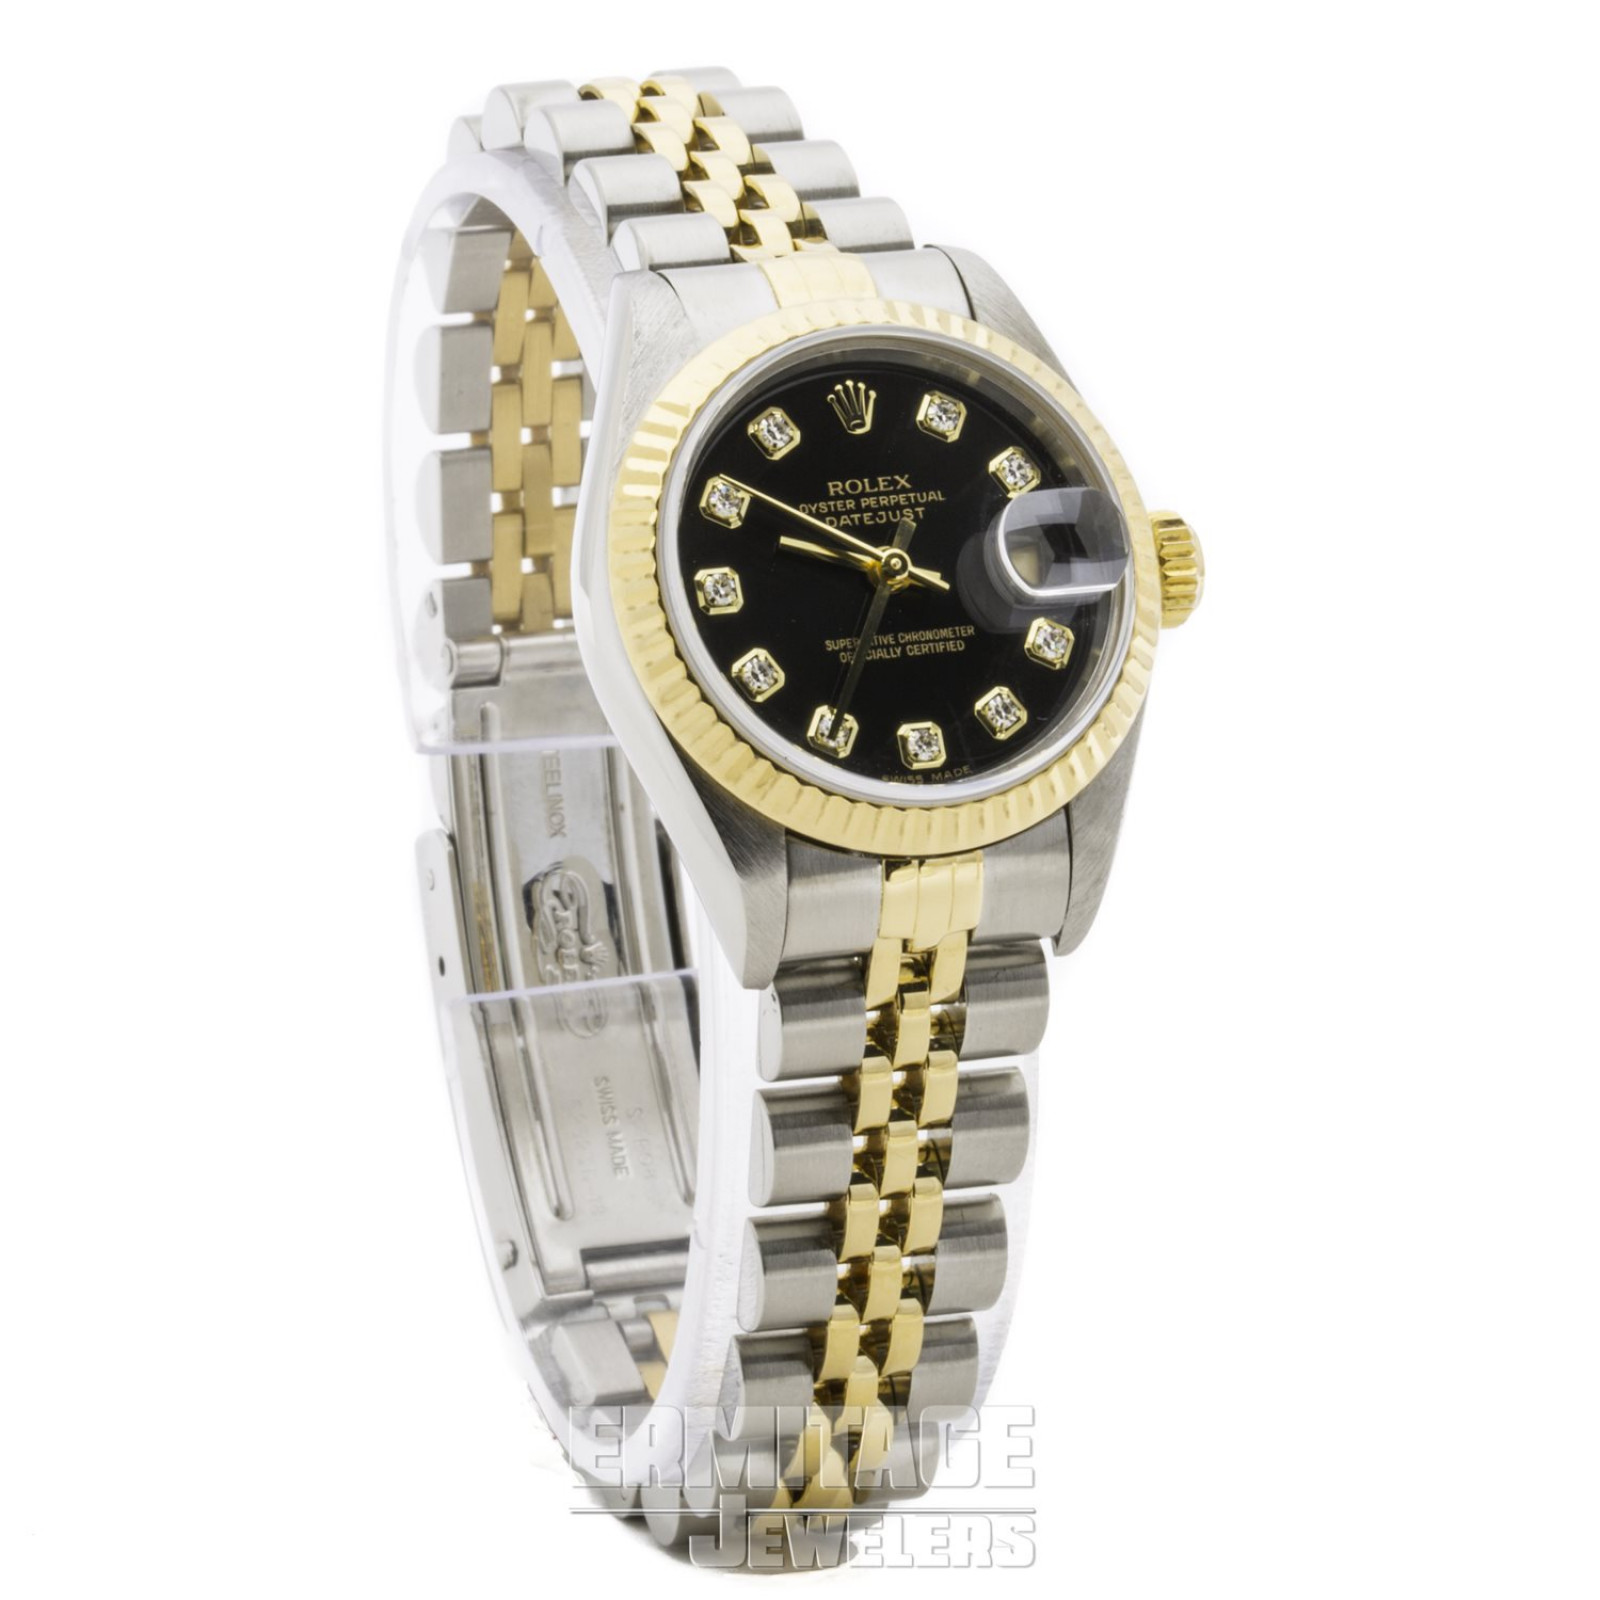 Yellow Gold Rolex Datejust 69173 26 mm